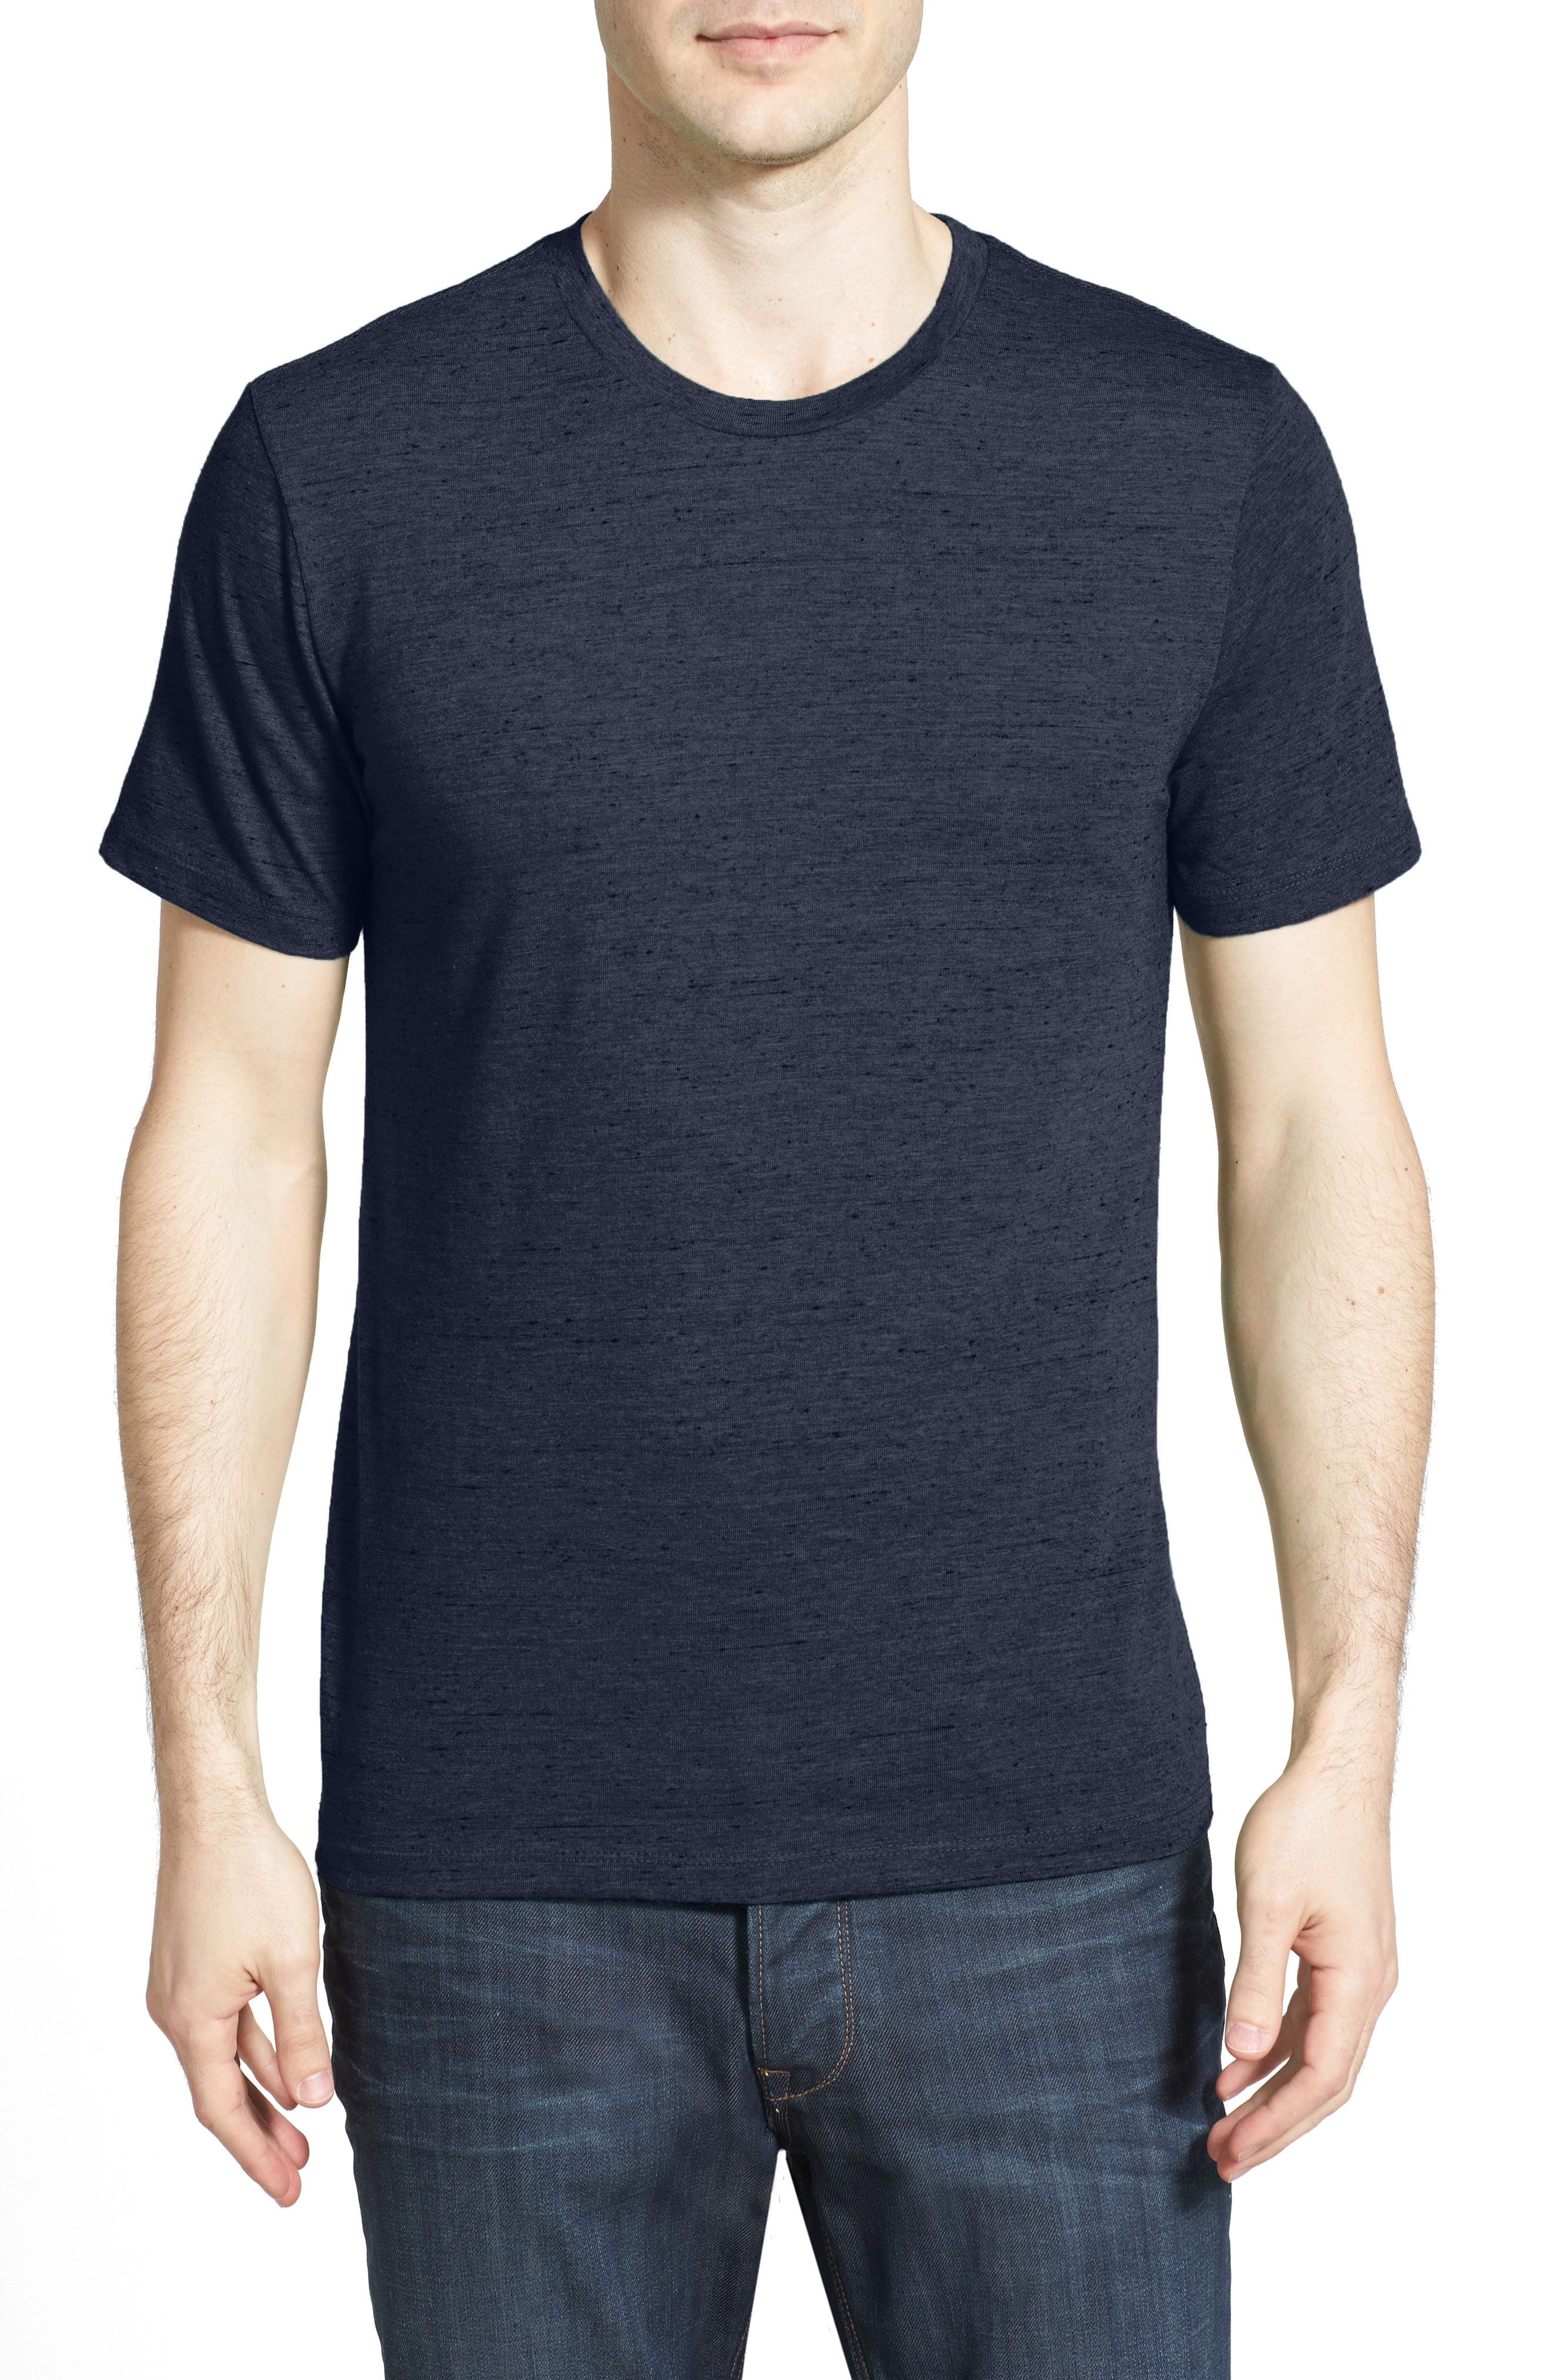 The Rail Slim Fit Crewneck T-Shirt